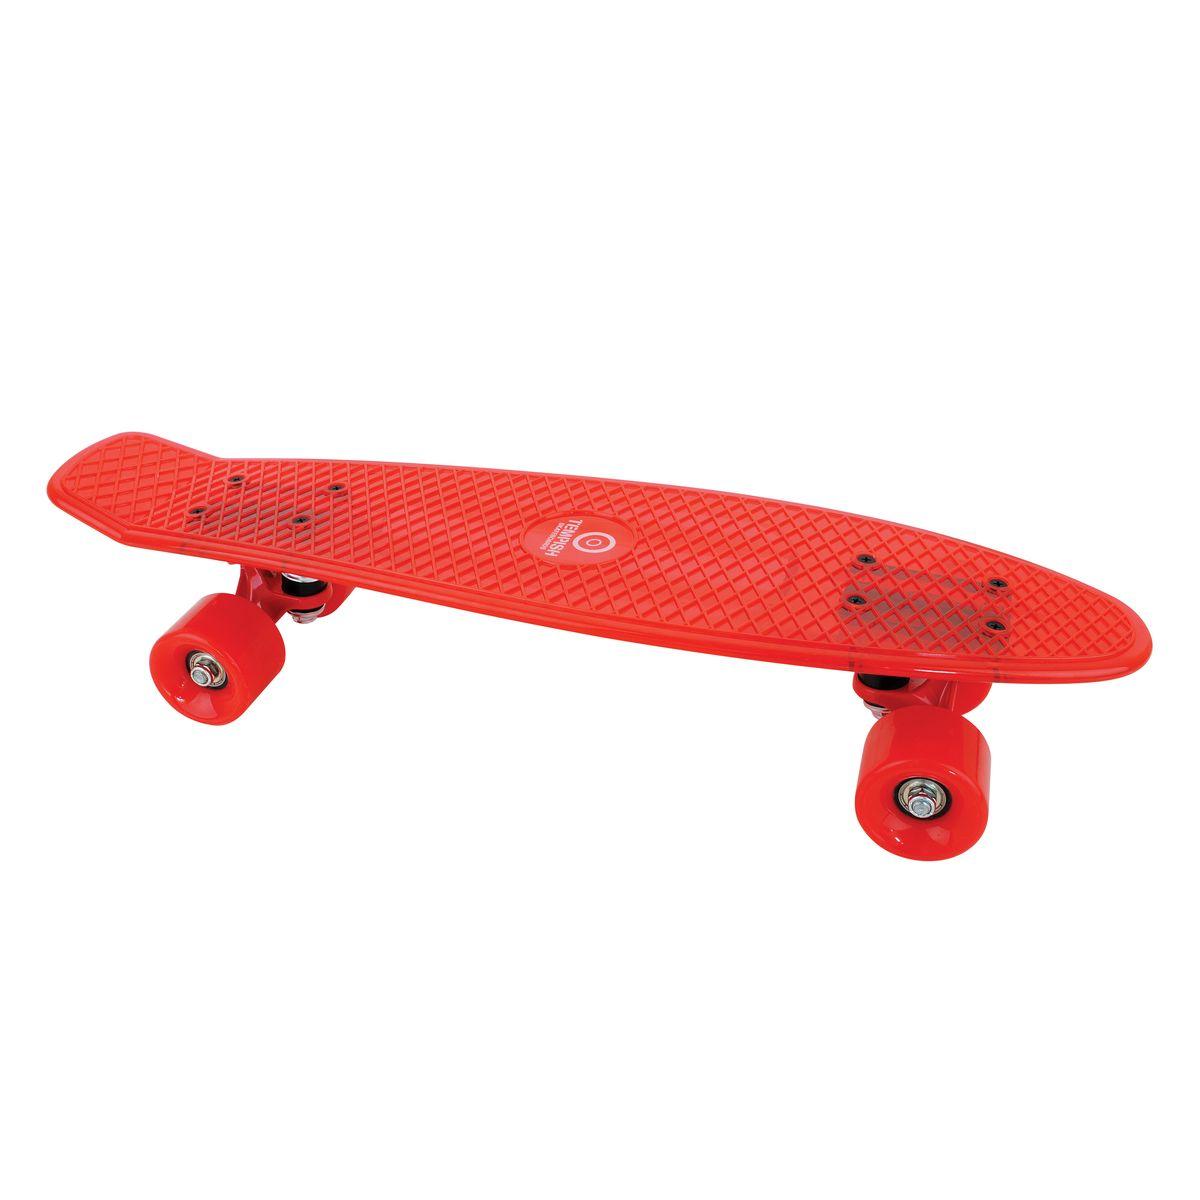 Скейтборд пластиковый Tempish Buffy Star, цвет: красный8592678058077Пени борд Tempish Buffy нагрузка до 100 кг